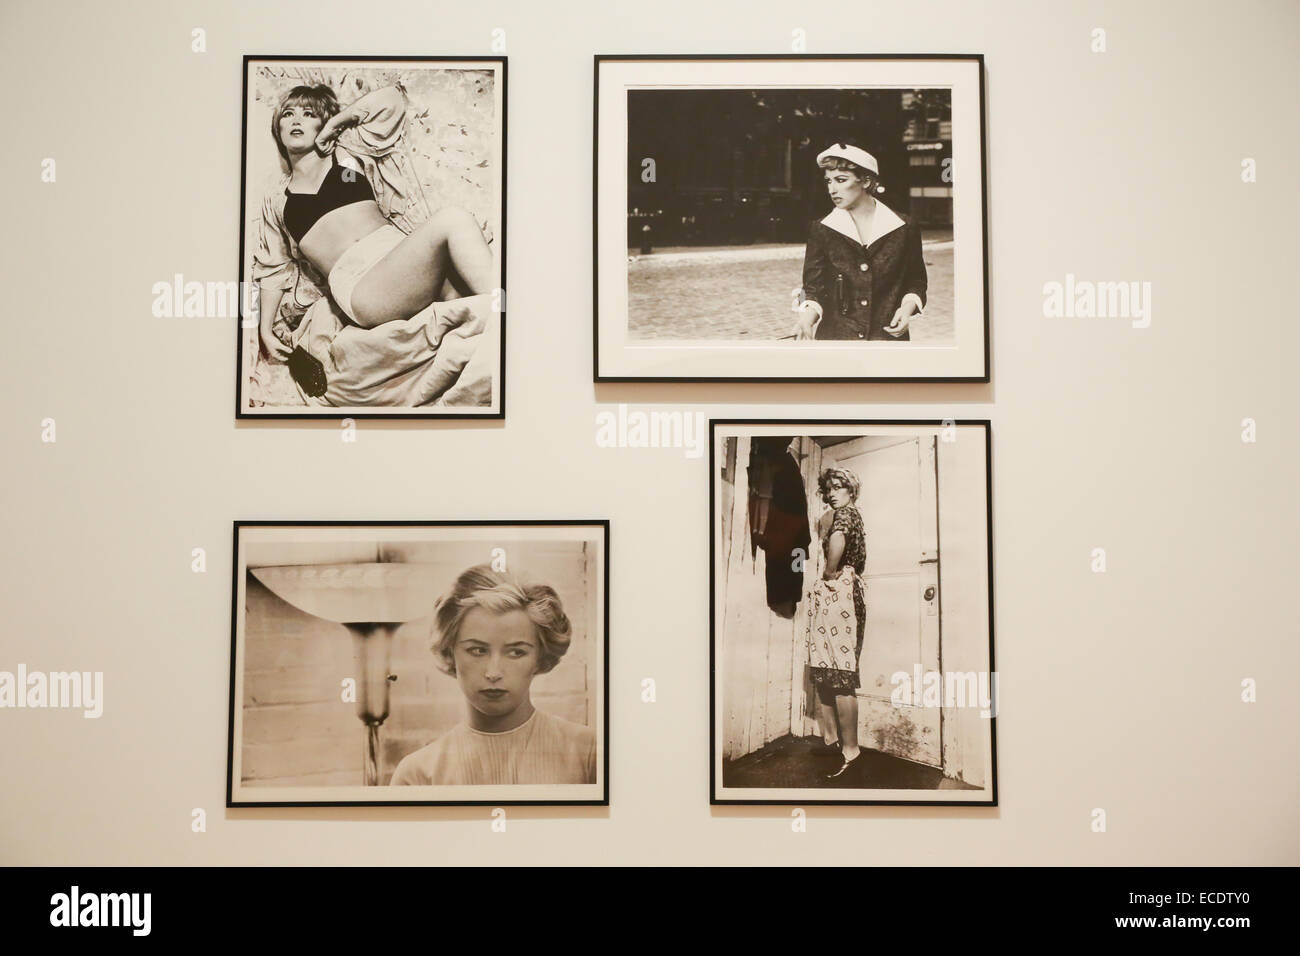 Cindy Sherman Stock Photos & Cindy Sherman Stock Images - Alamy